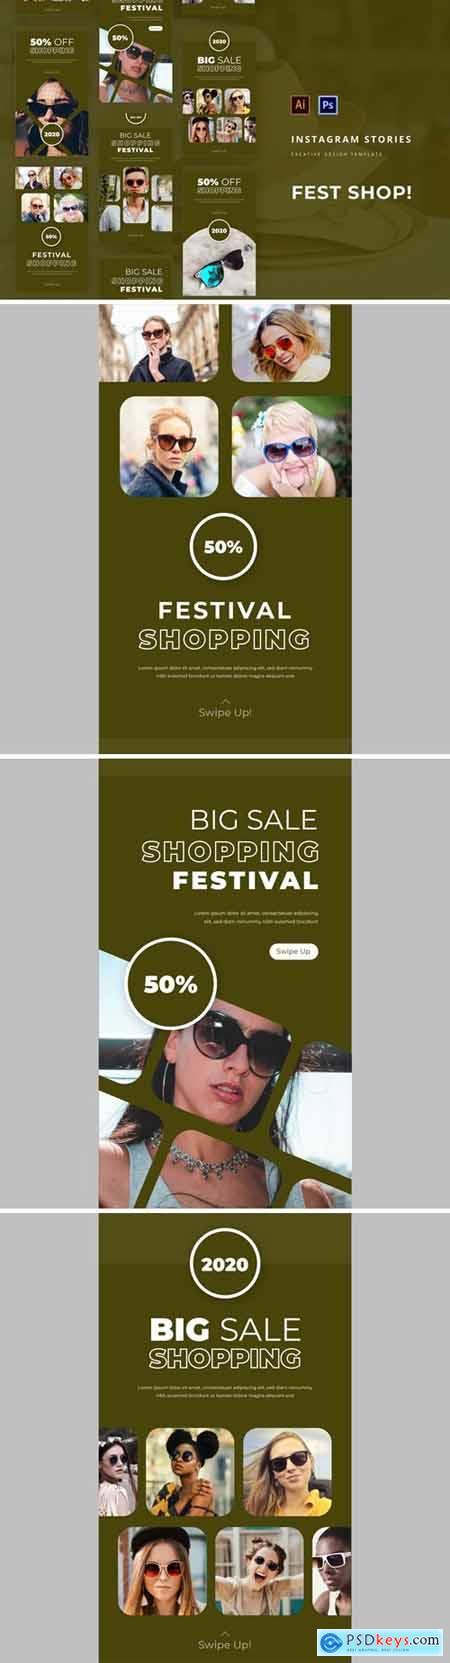 Fest Shop Instagram Story Template